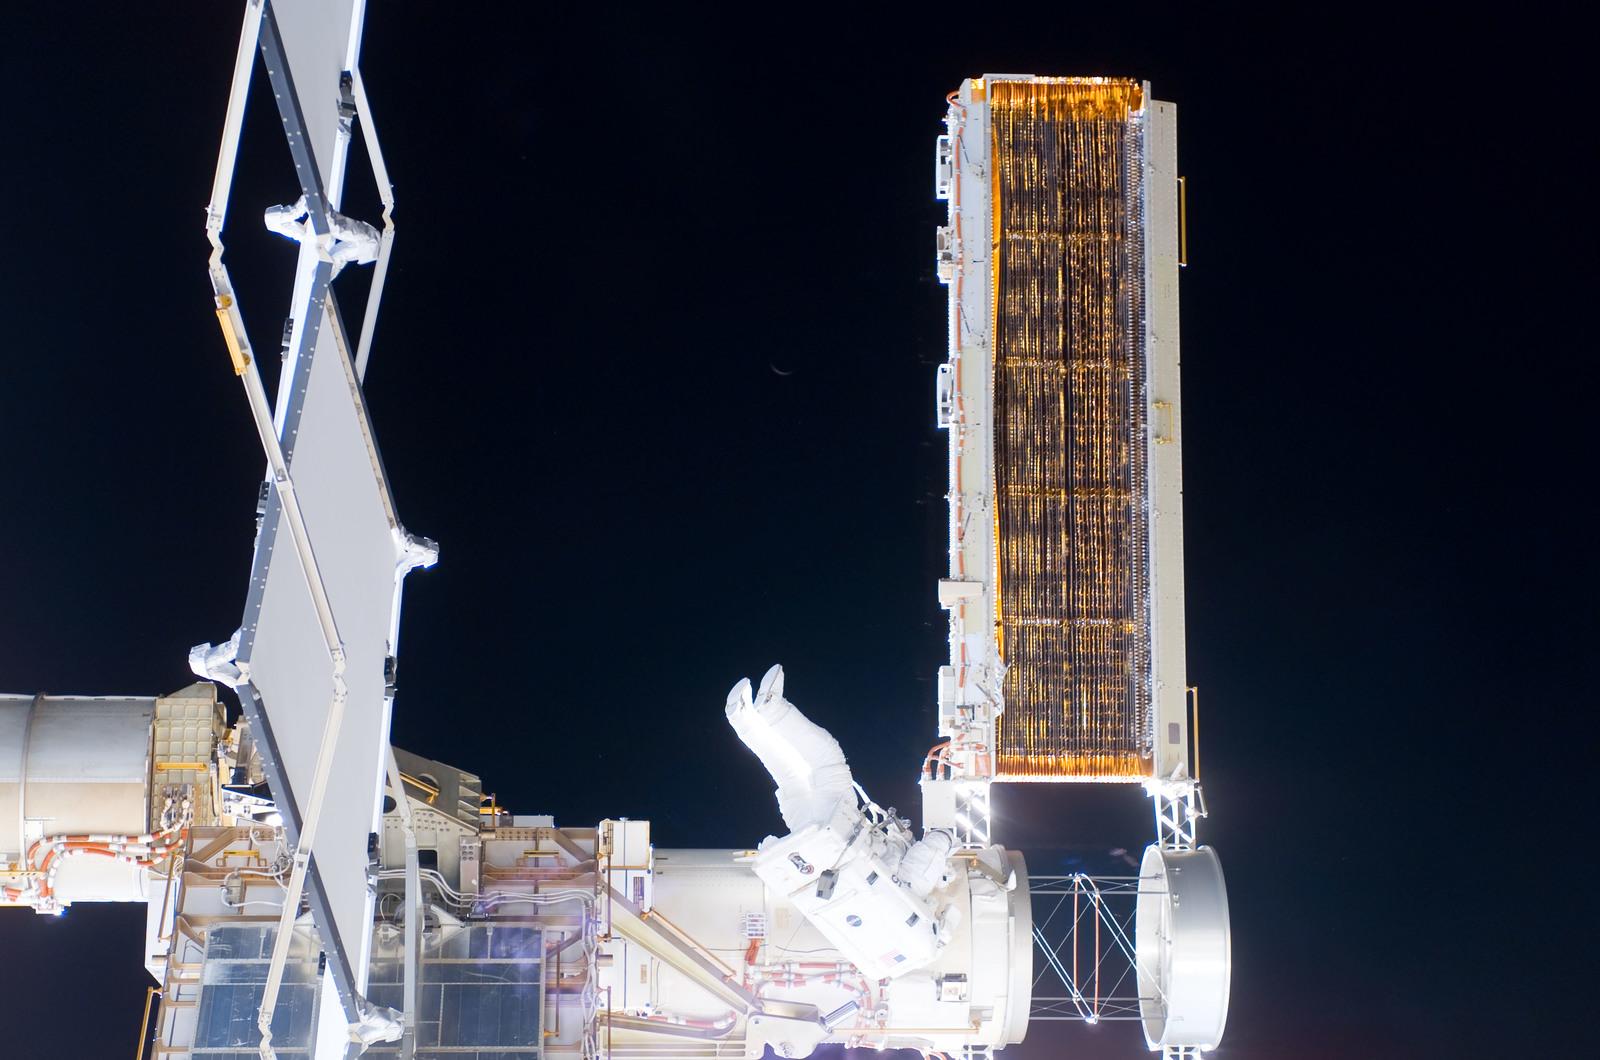 S116E06862 - STS-116 - STS-116 MS Fuglesang during EVA 4